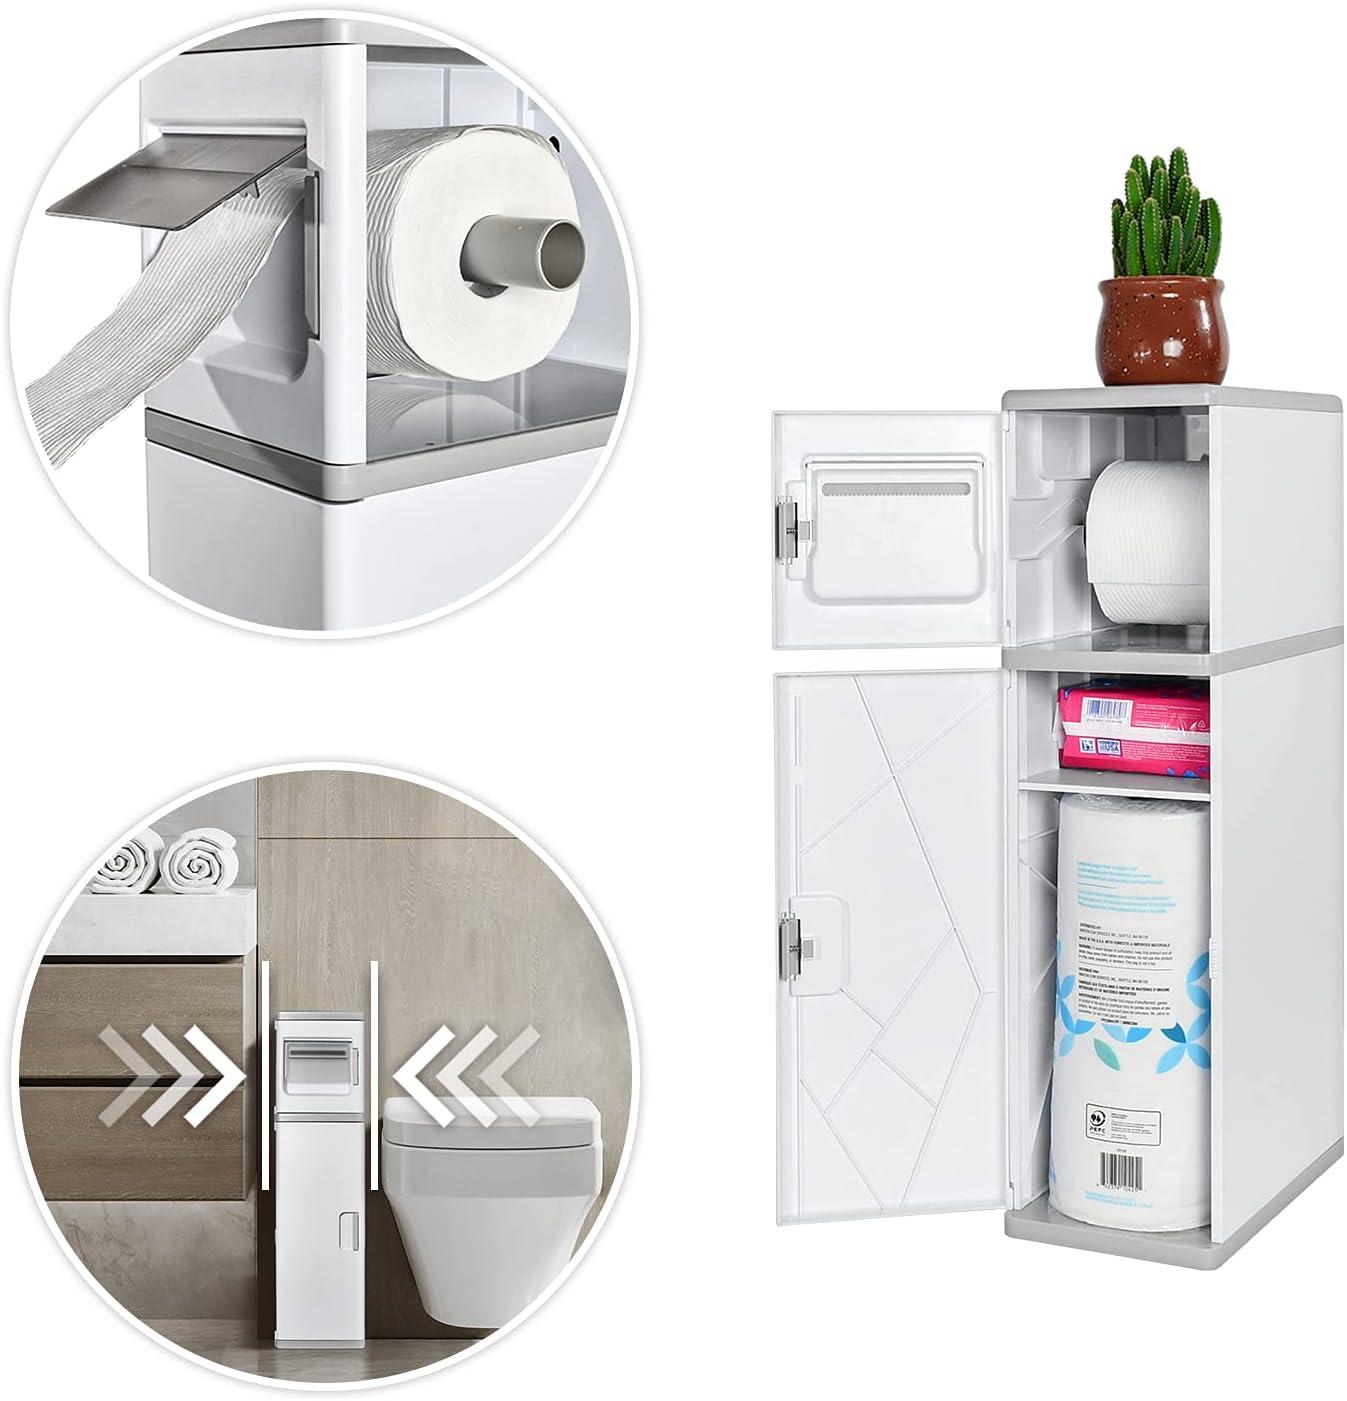 New product! New type ESTHELLO Bathroom Max 50% OFF Storage Toilet Tall Cab Paper Narrow